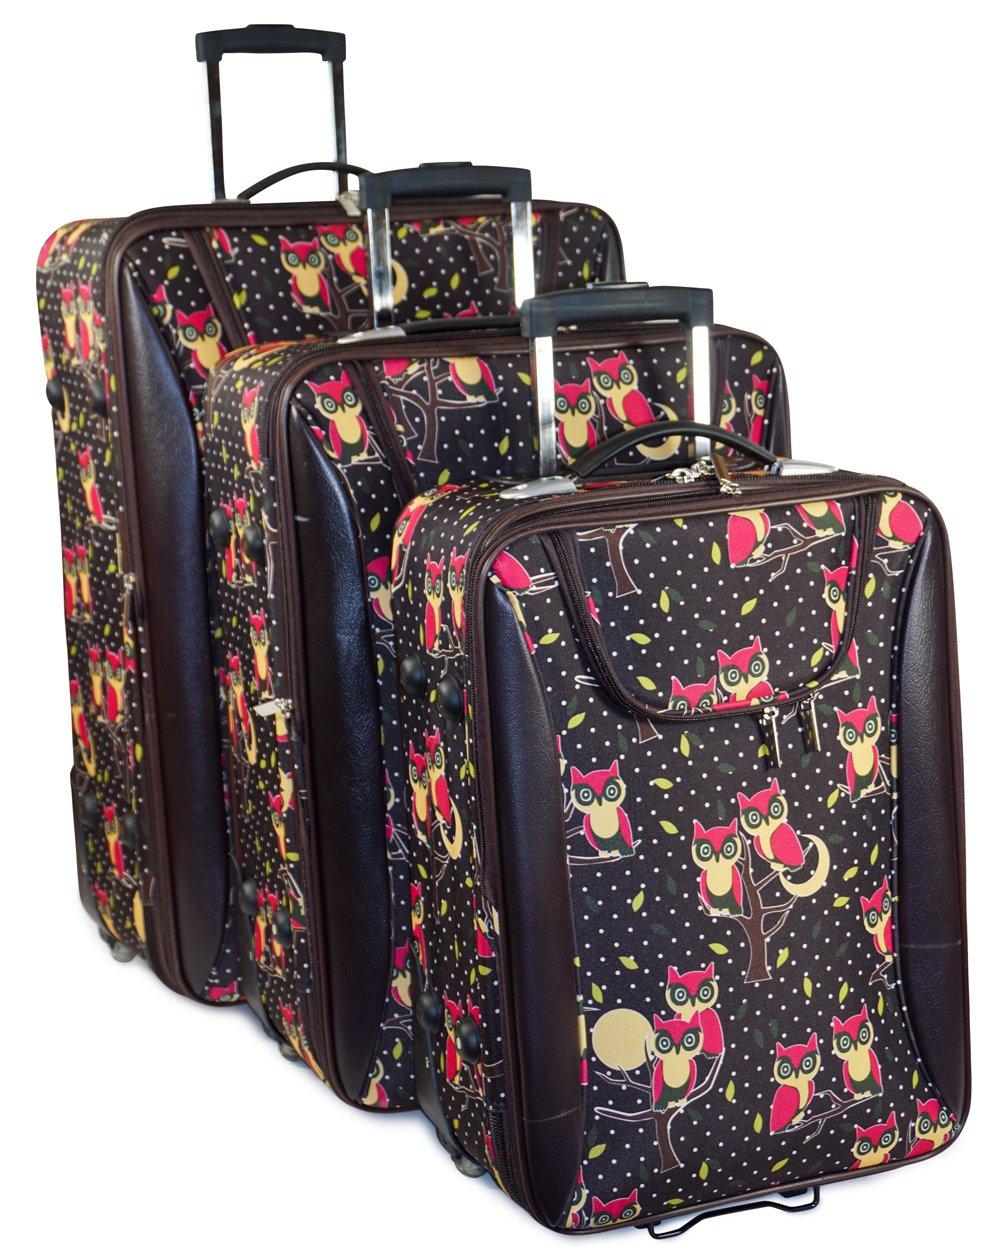 J Garden Brown Owl Print 3 Piece Expandable Luggage Set